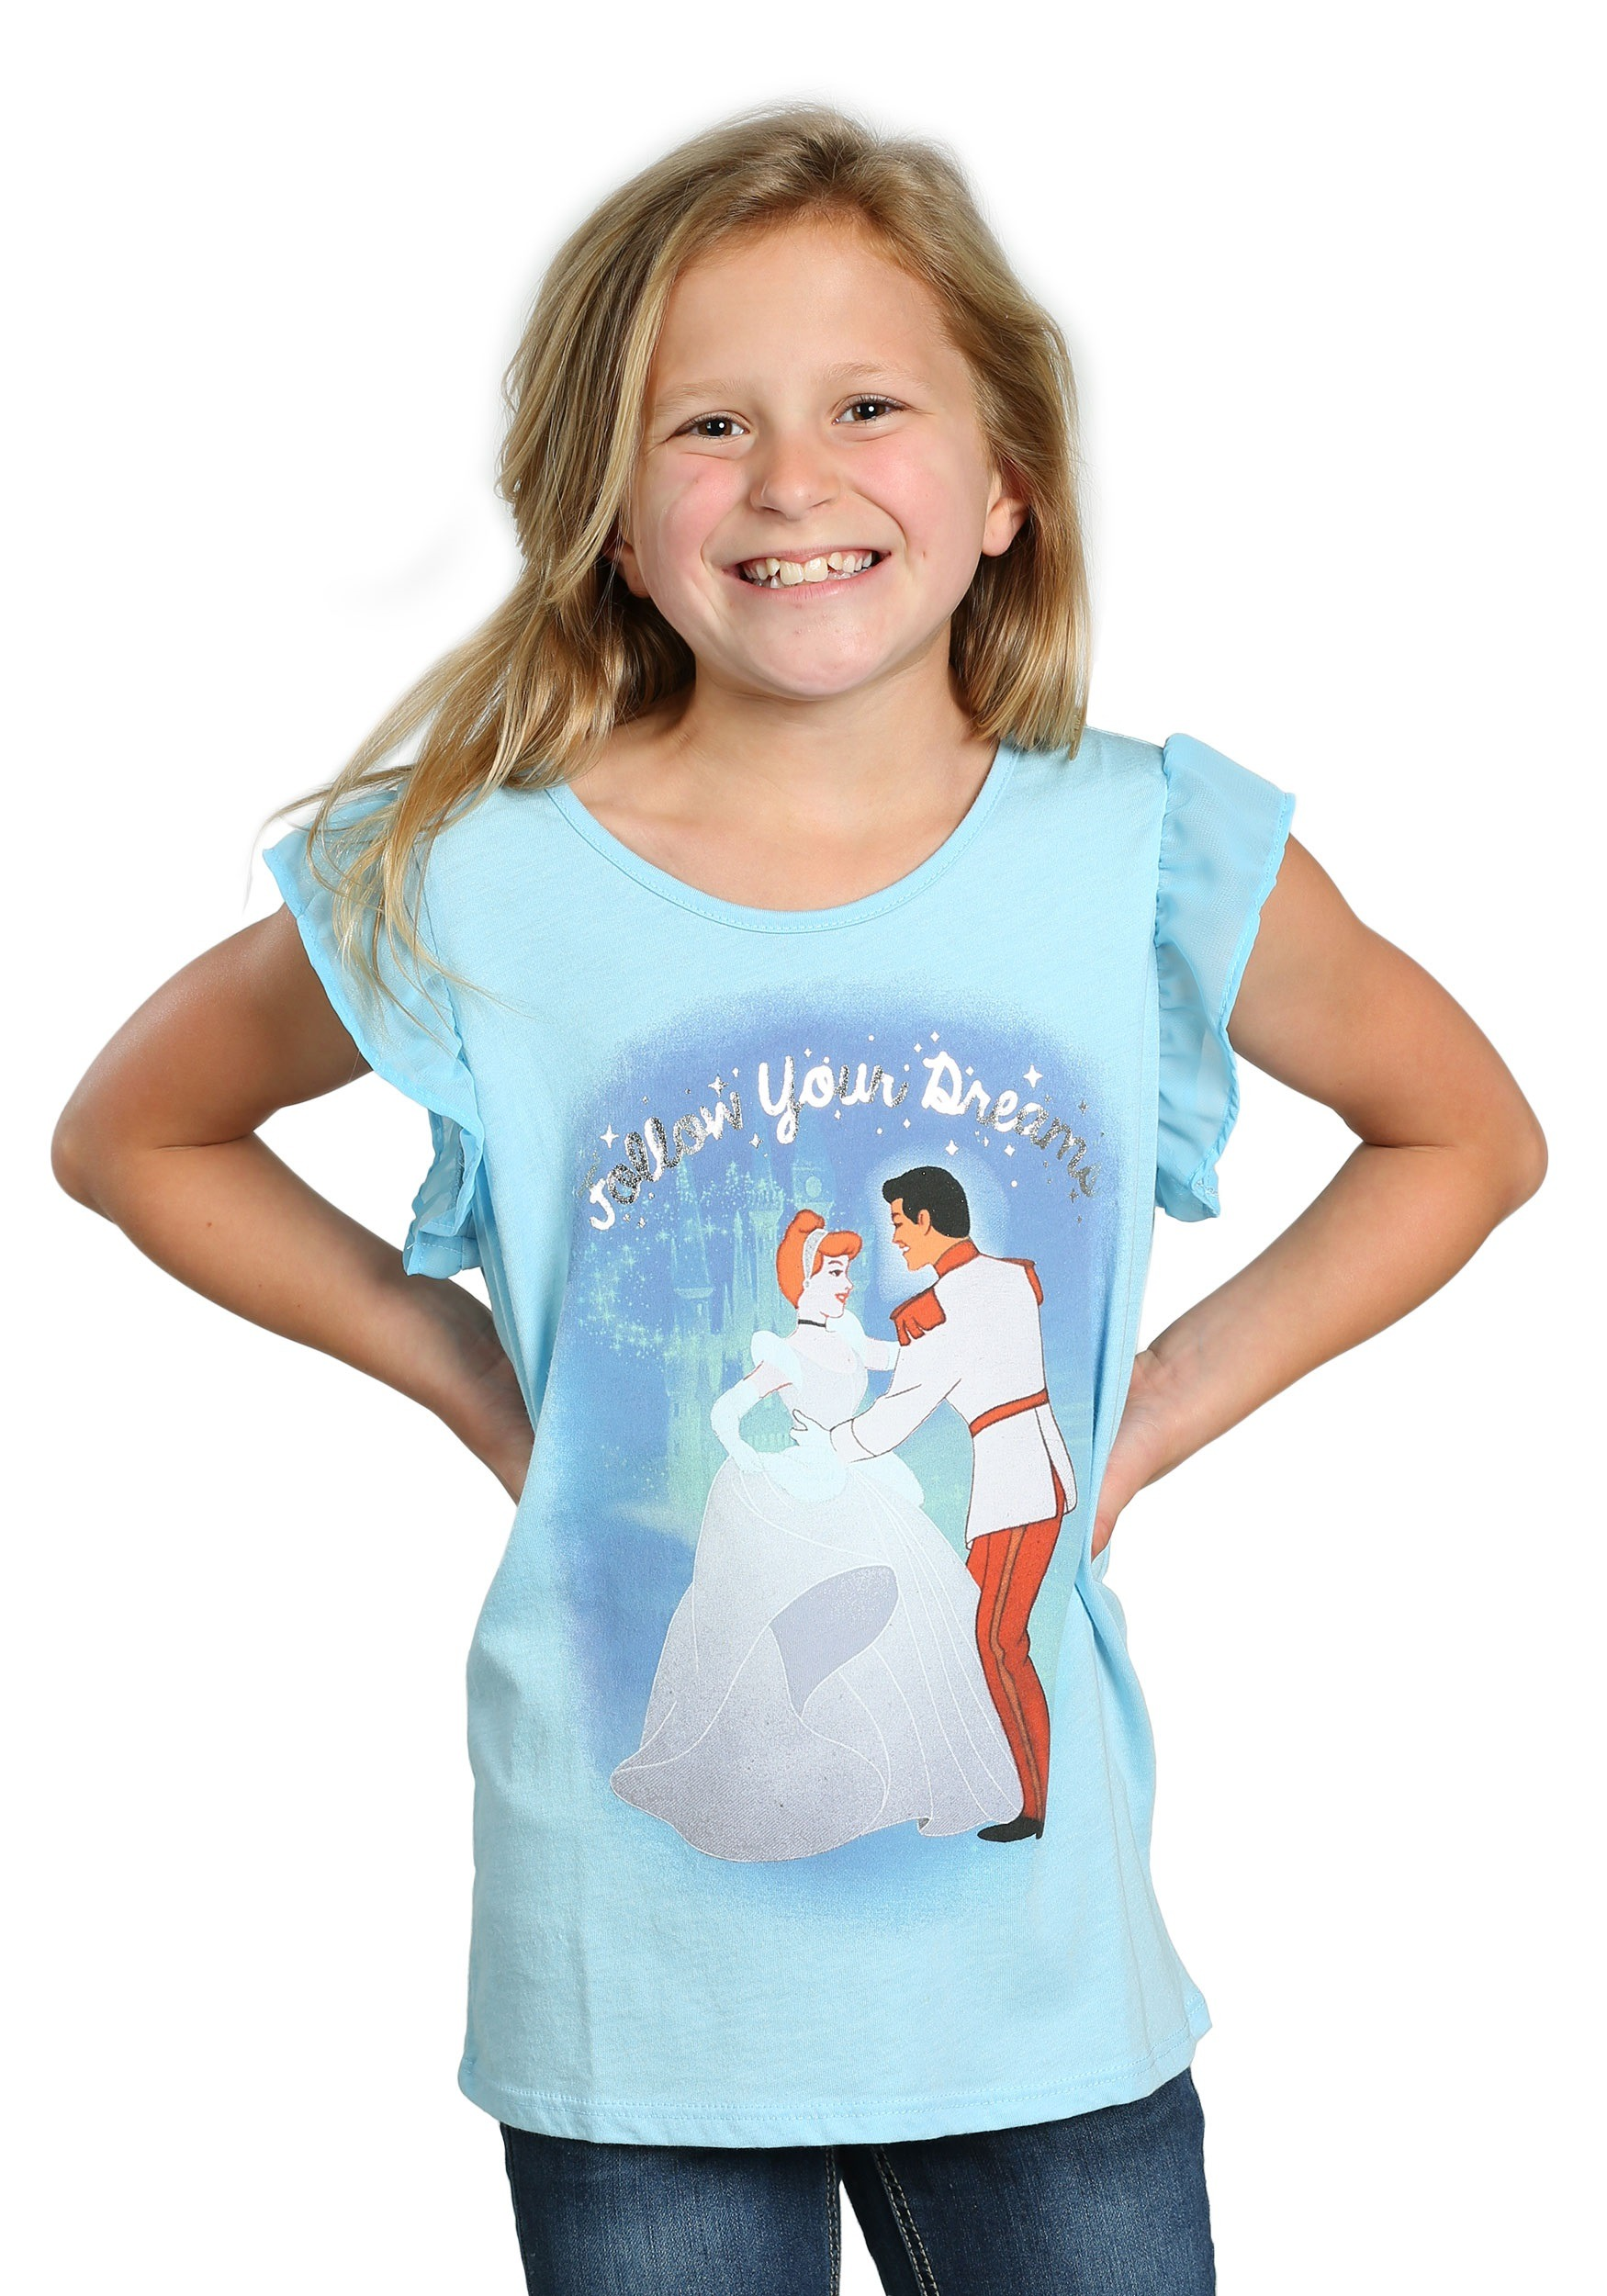 Cinderella Dancing Follow Your Dreams Girls T-Shirt